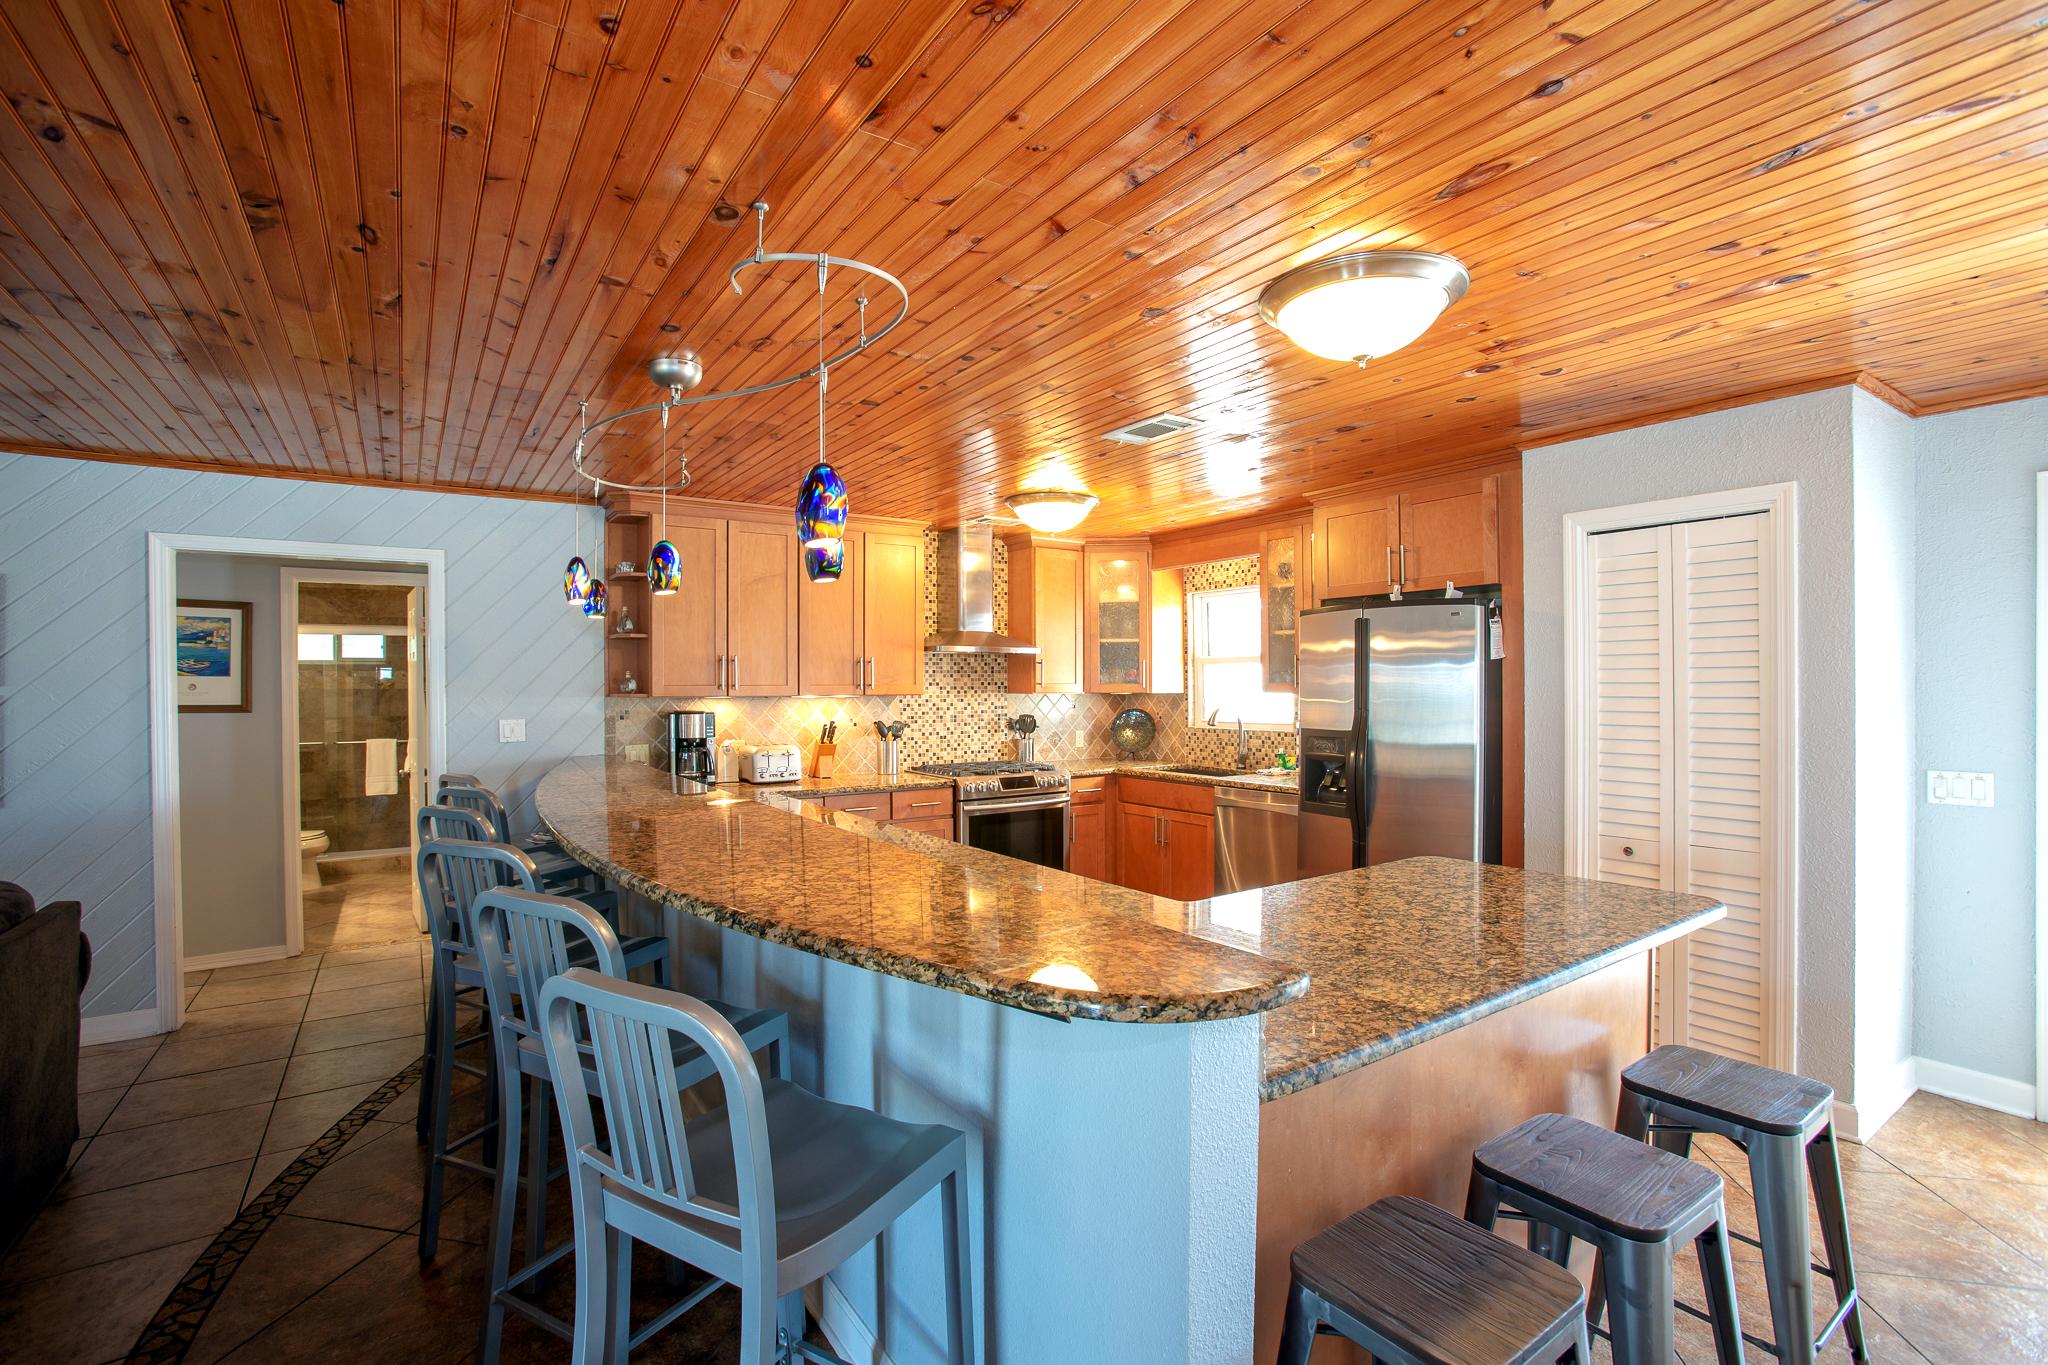 Maldonado 1015 - Sea the Big Picture House/Cottage rental in Pensacola Beach House Rentals in Pensacola Beach Florida - #7